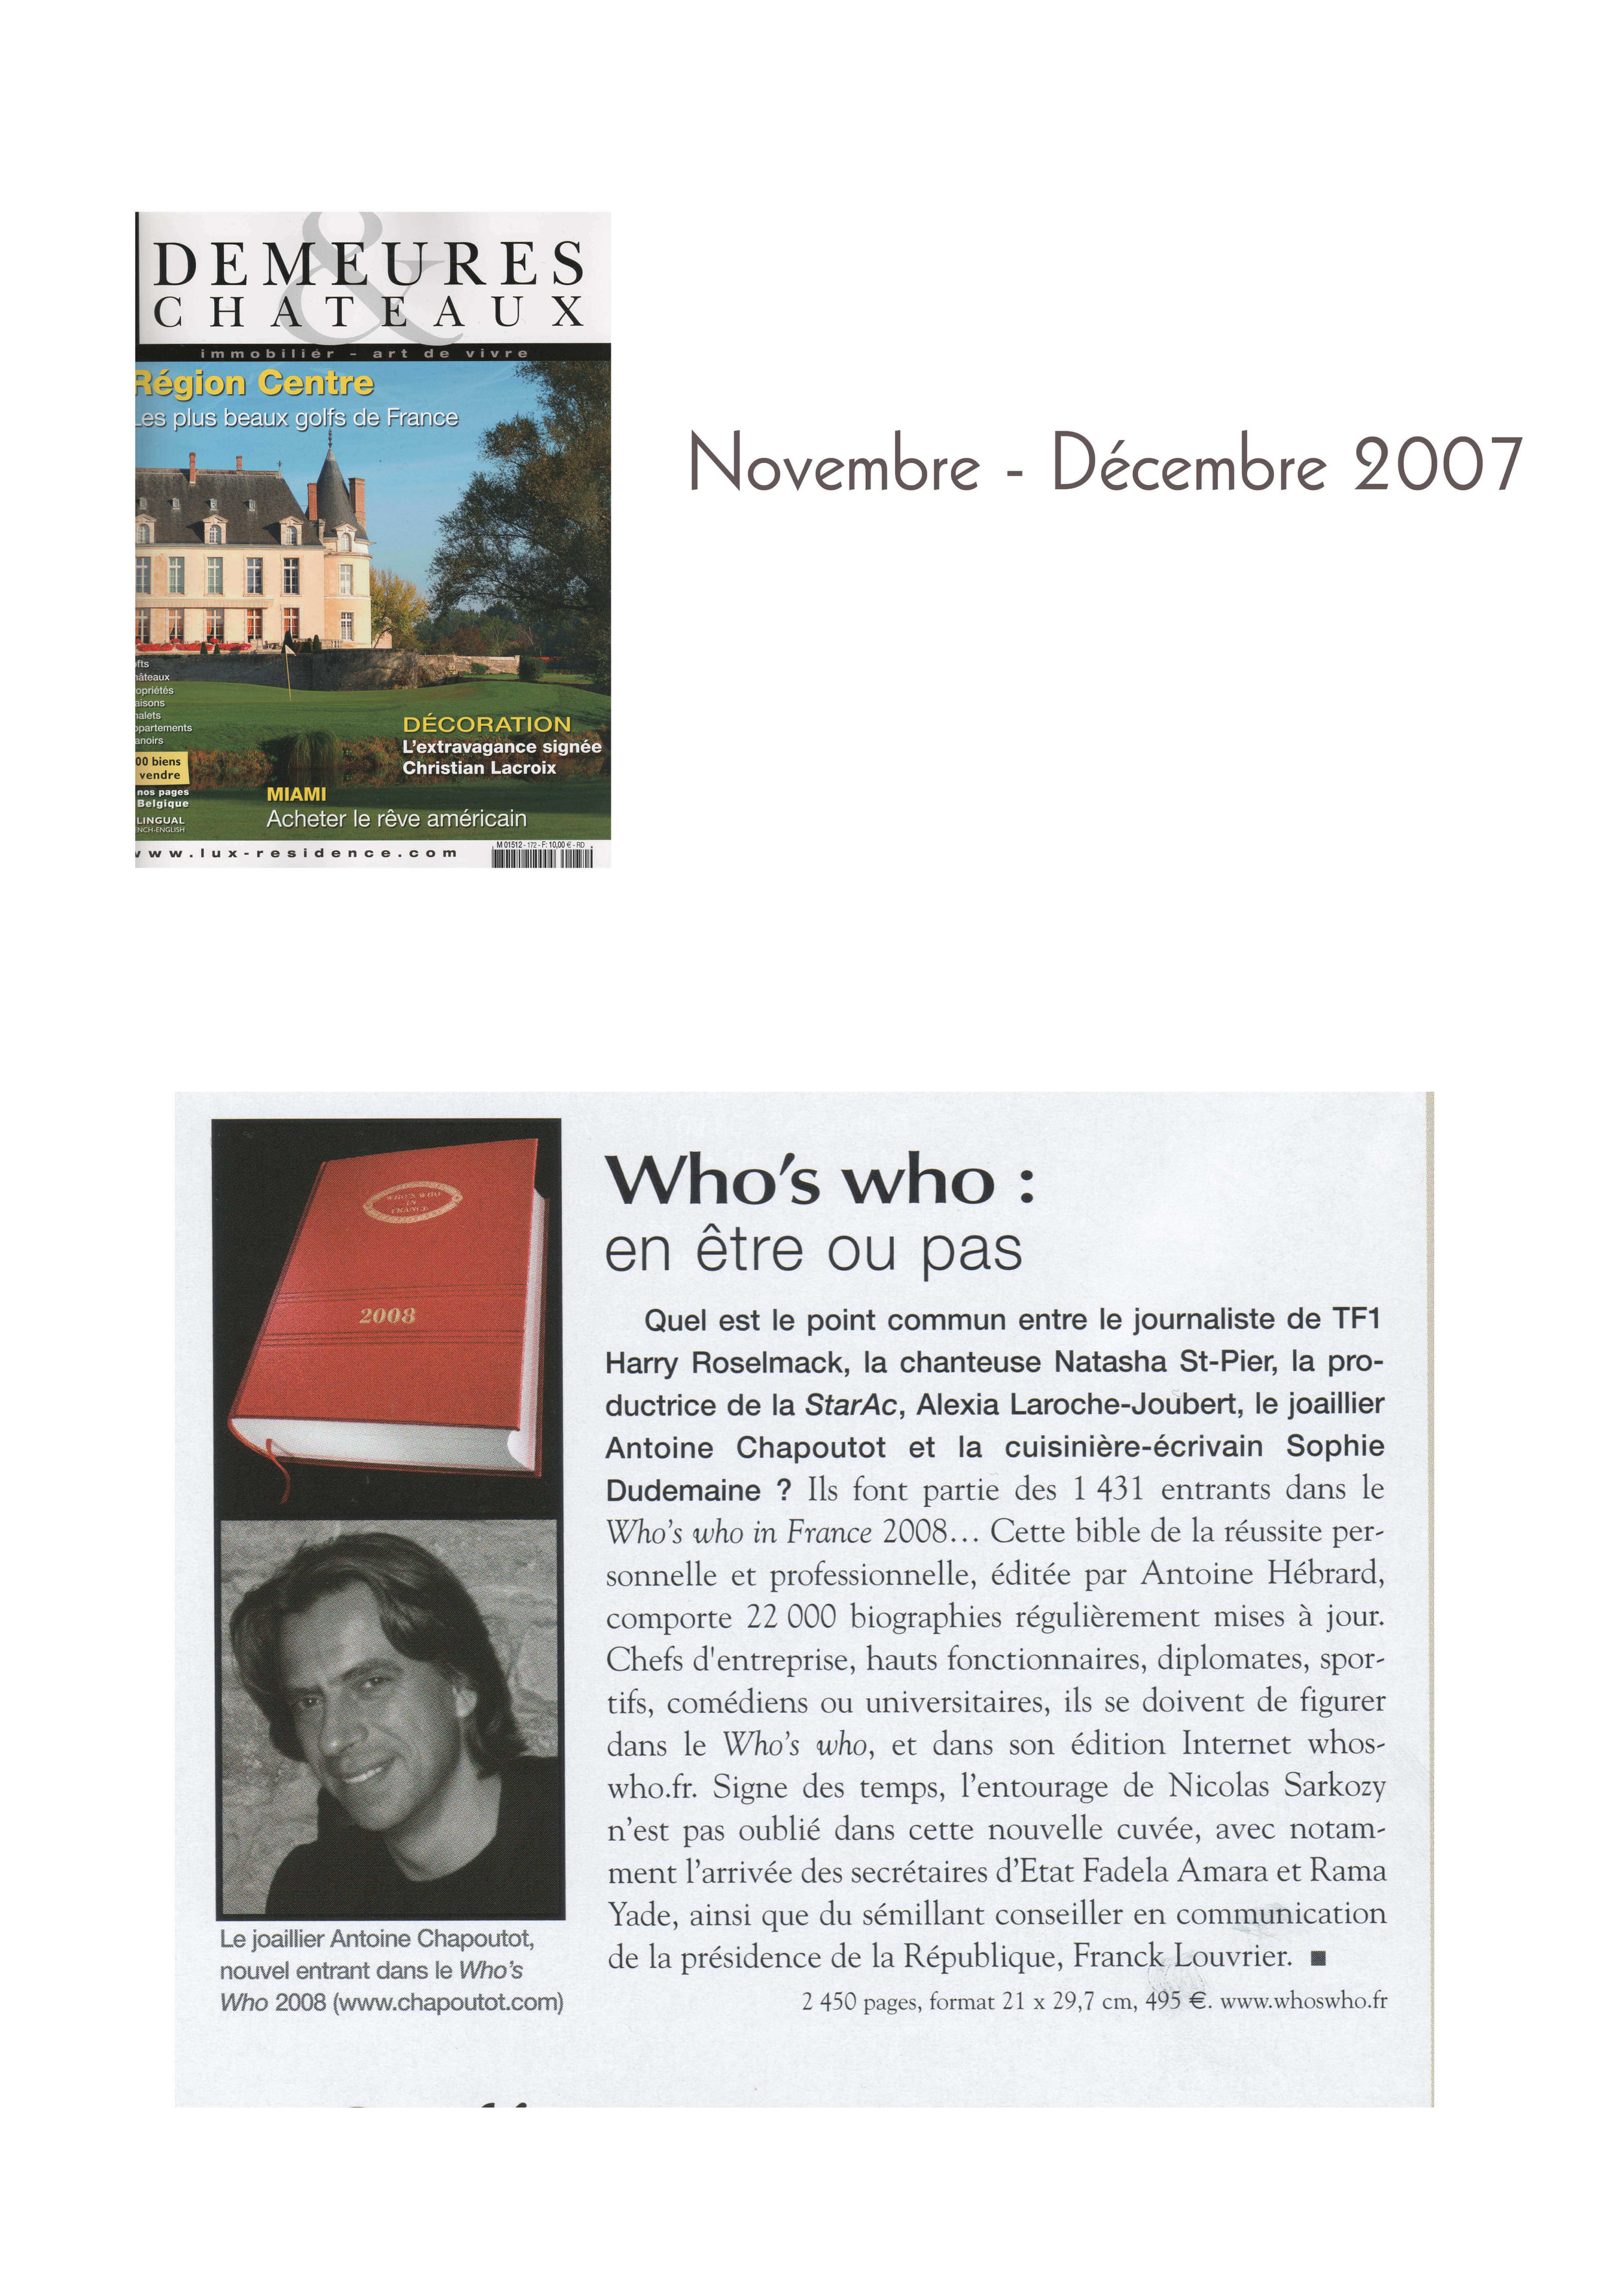 2007 Demeure & Chateaux - Novembre 2007.jpg